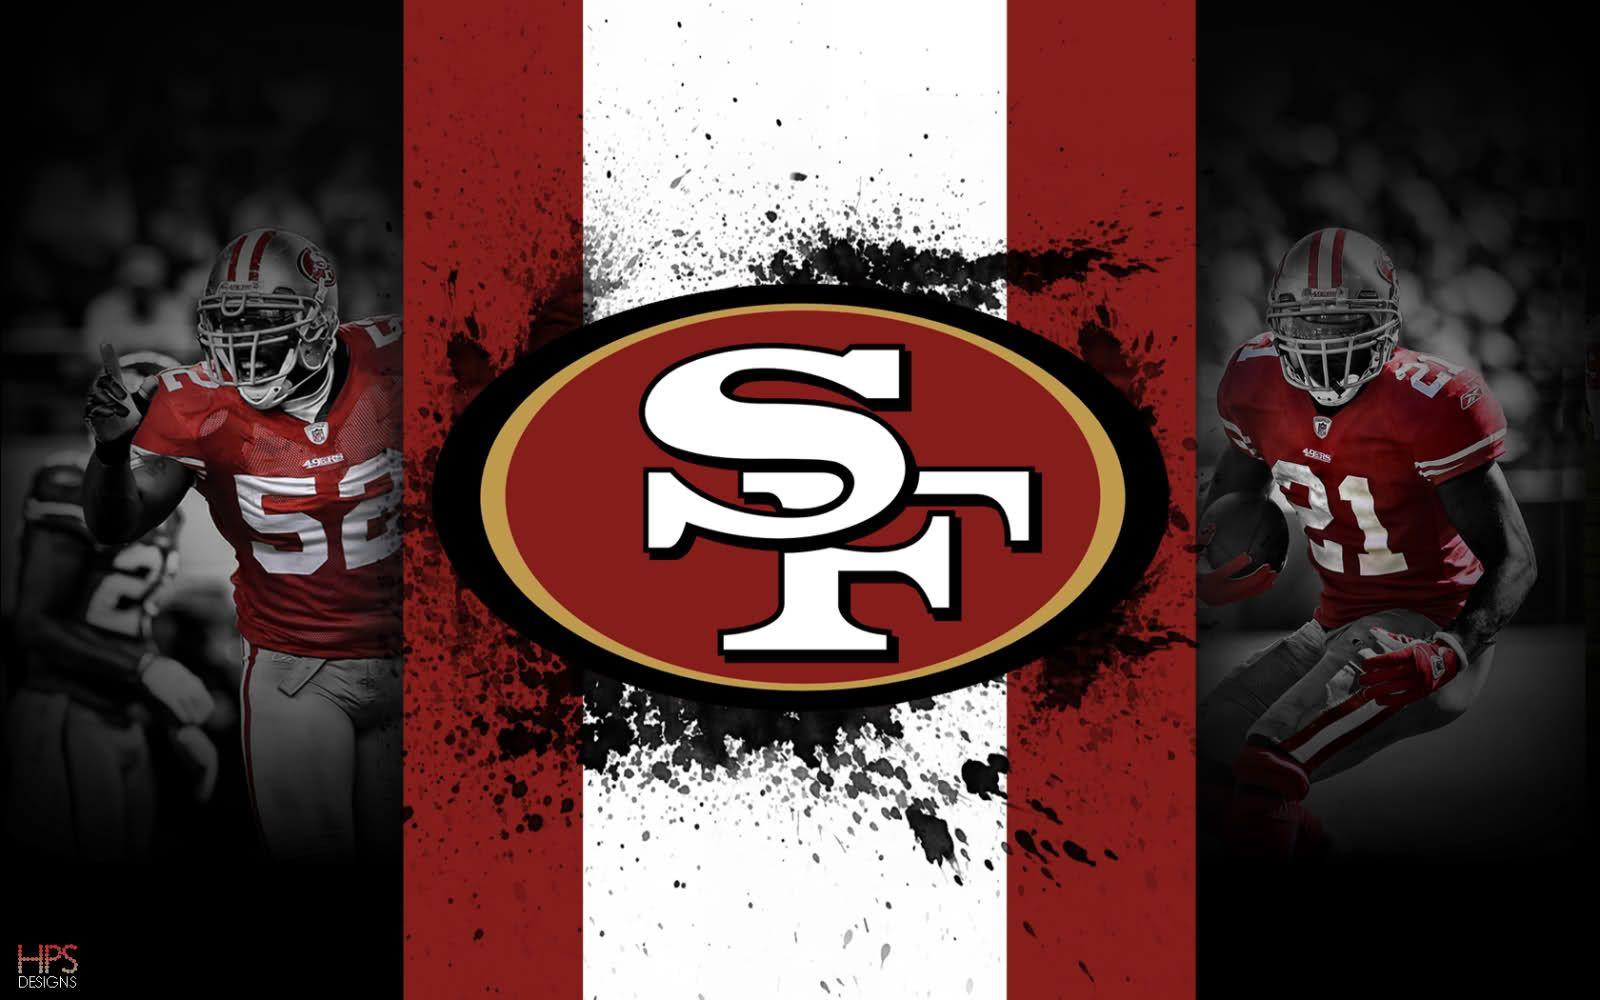 Patrick Willis & Frank Gore, 49ers Nfl football